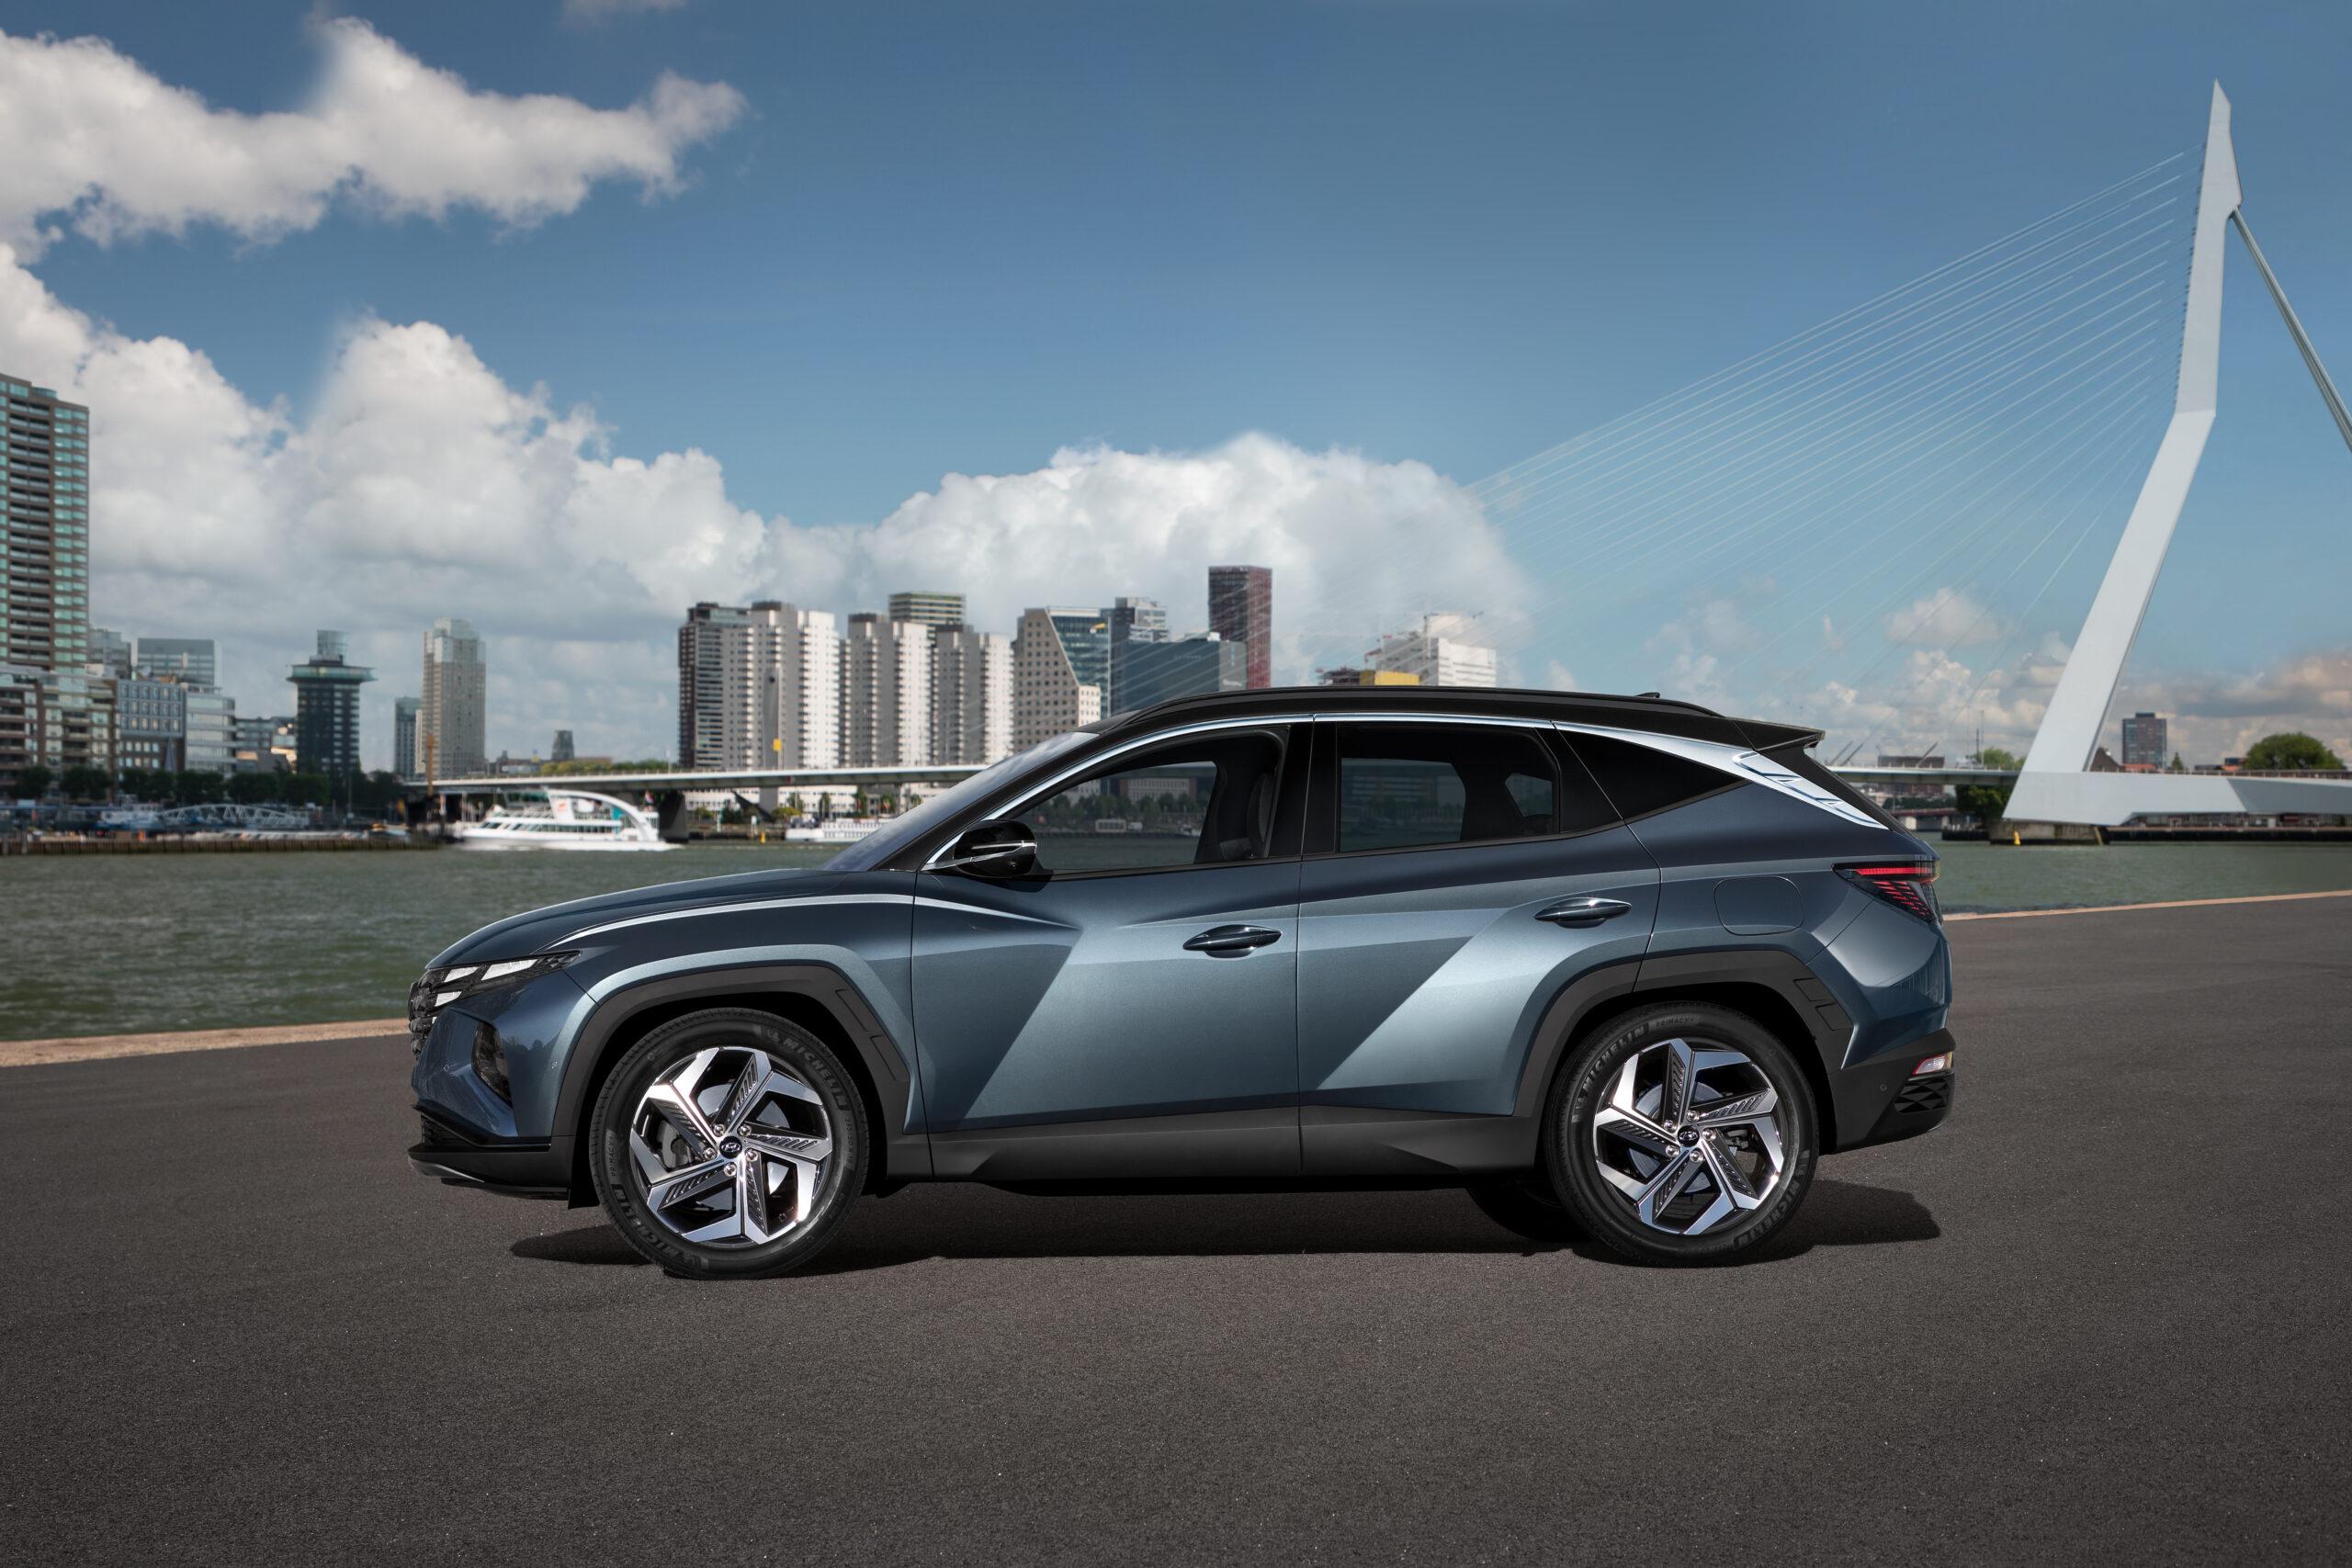 all-new Hyundai Tucson Garage Guex